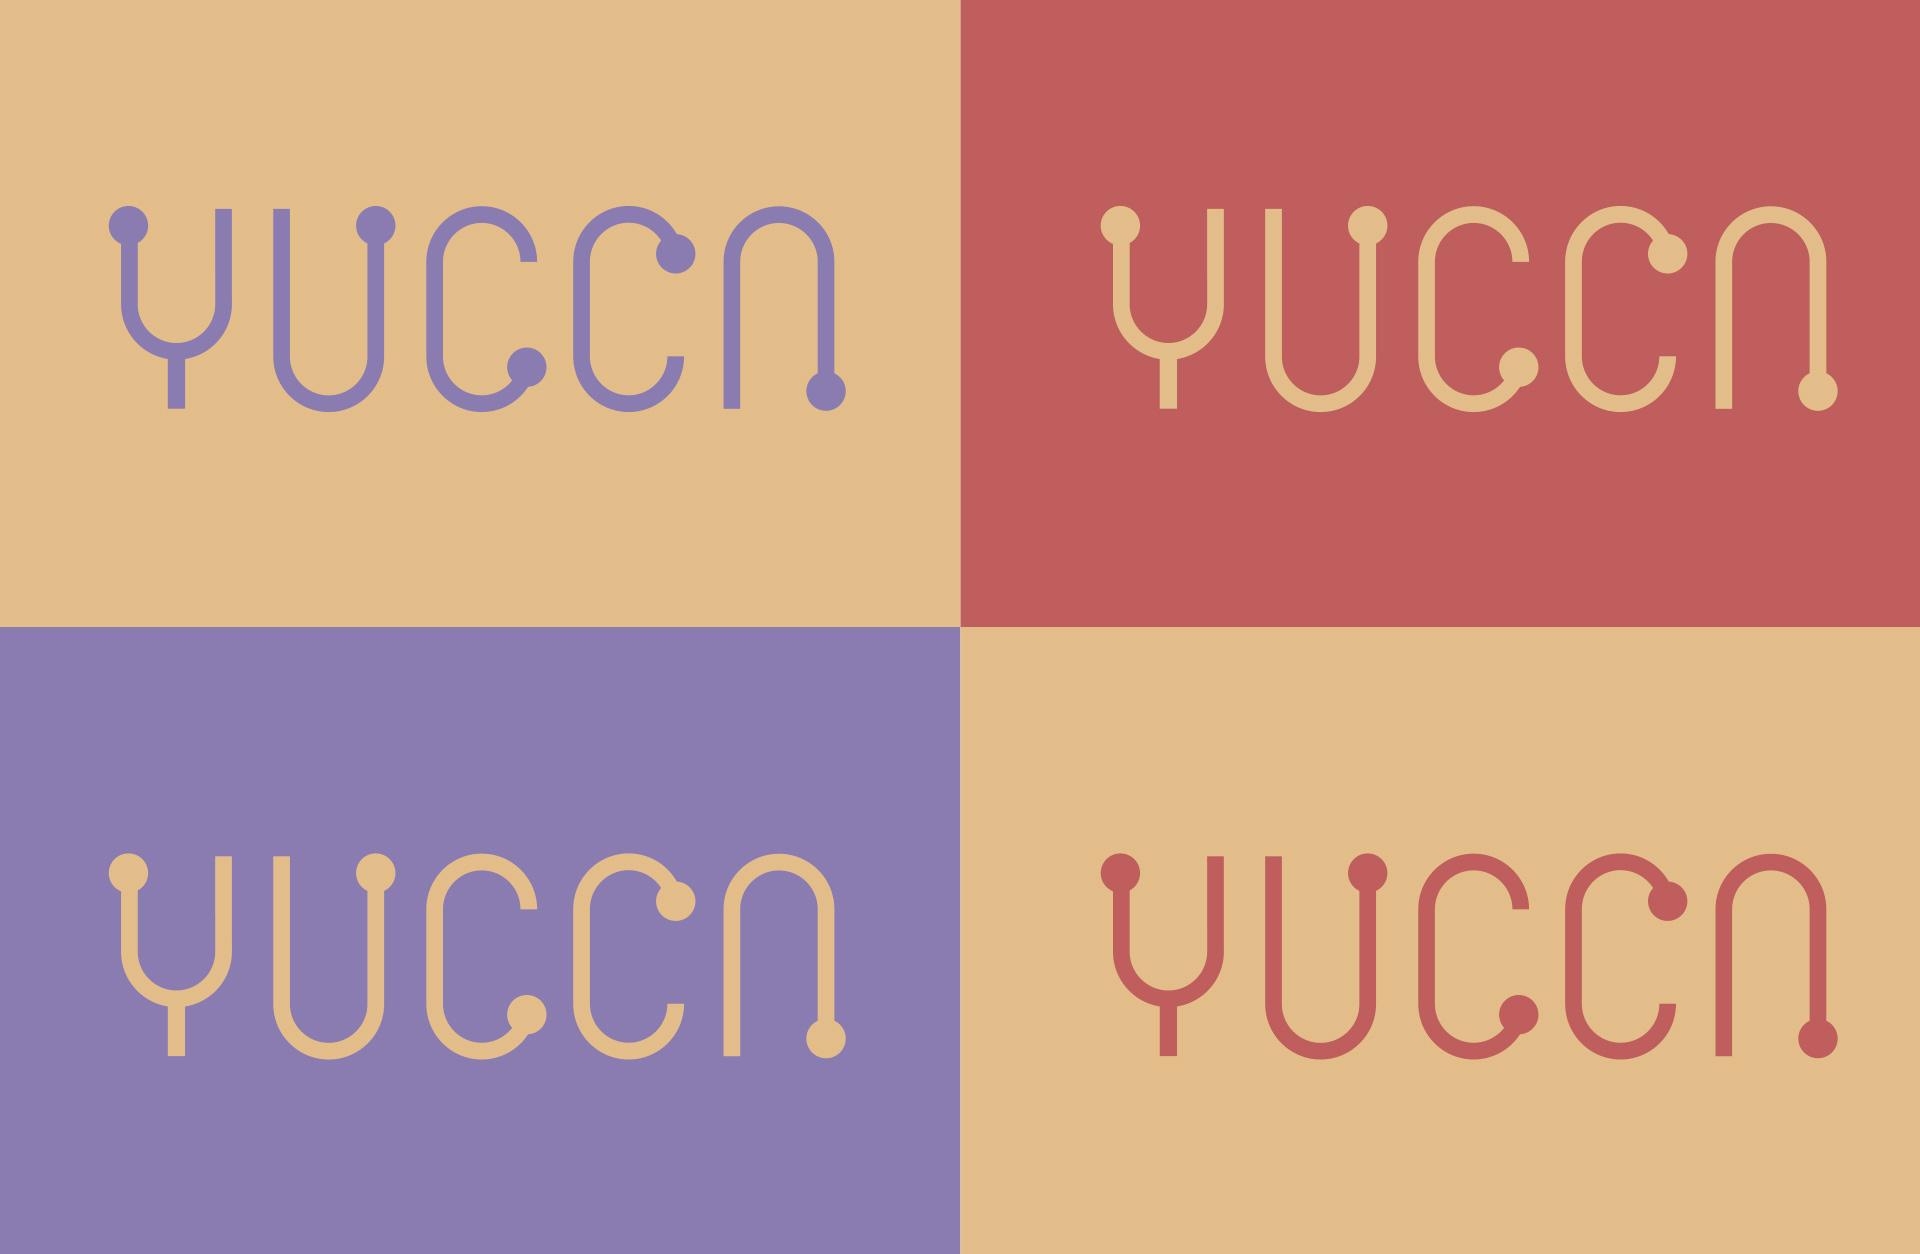 Alice_Stivala_Visual_Designer_Yucca_logotipo_5